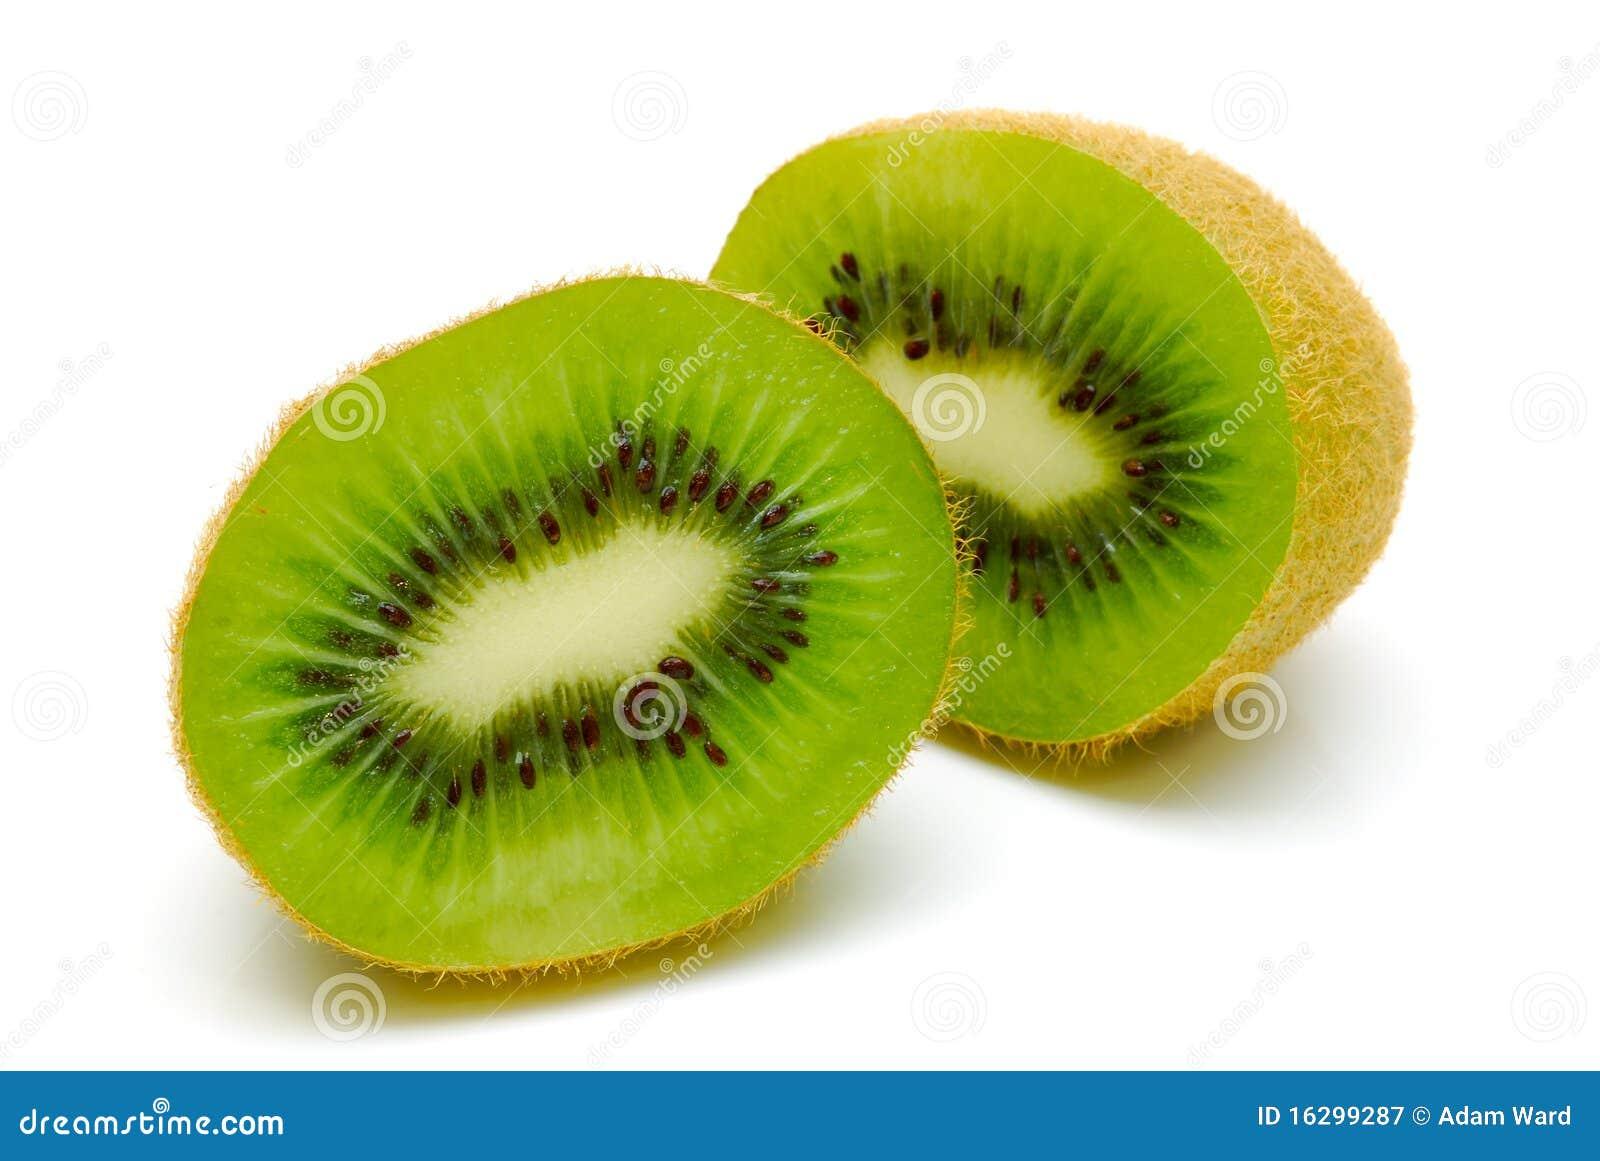 Kiwi Fruit Cut In Half Royalty Free Stock Photography - Image ...